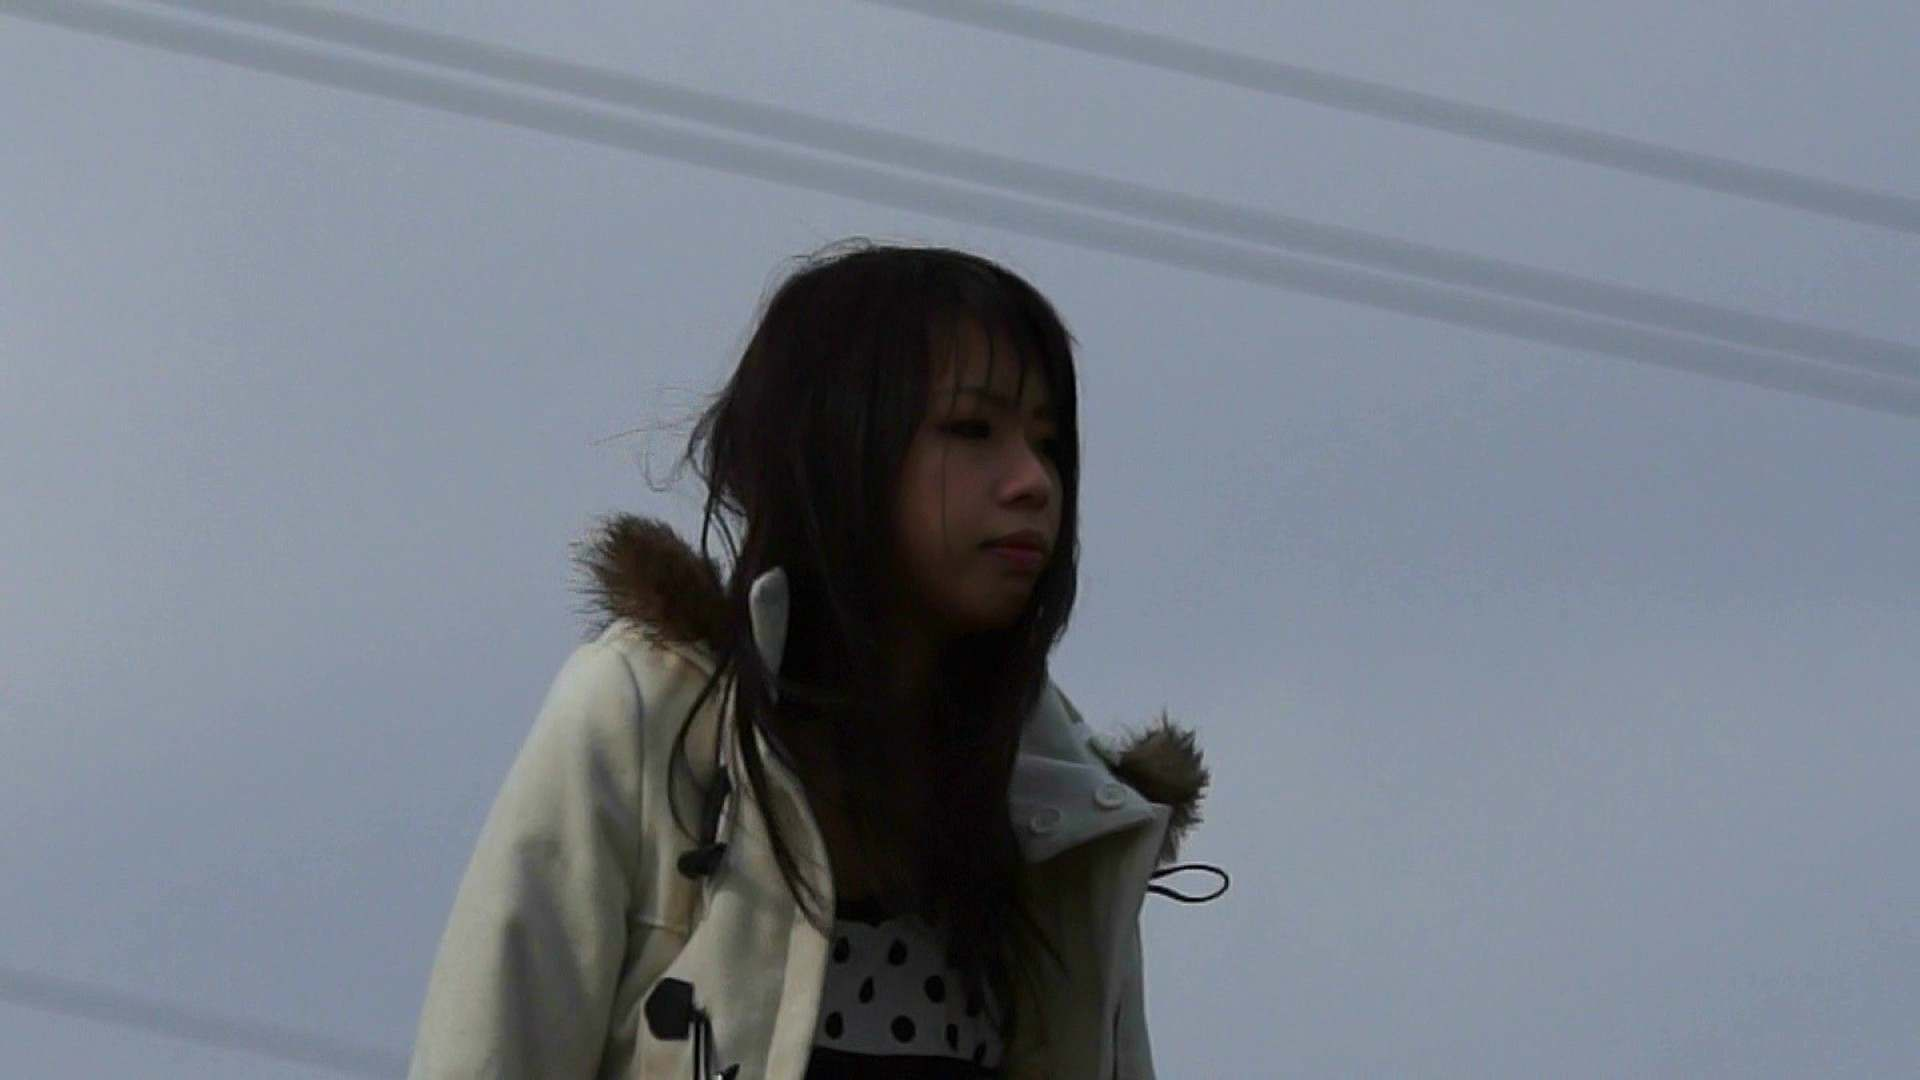 vol.2 自宅近く思い出の地で黄昏る志穂さん 色っぽいOL達  79pic 54